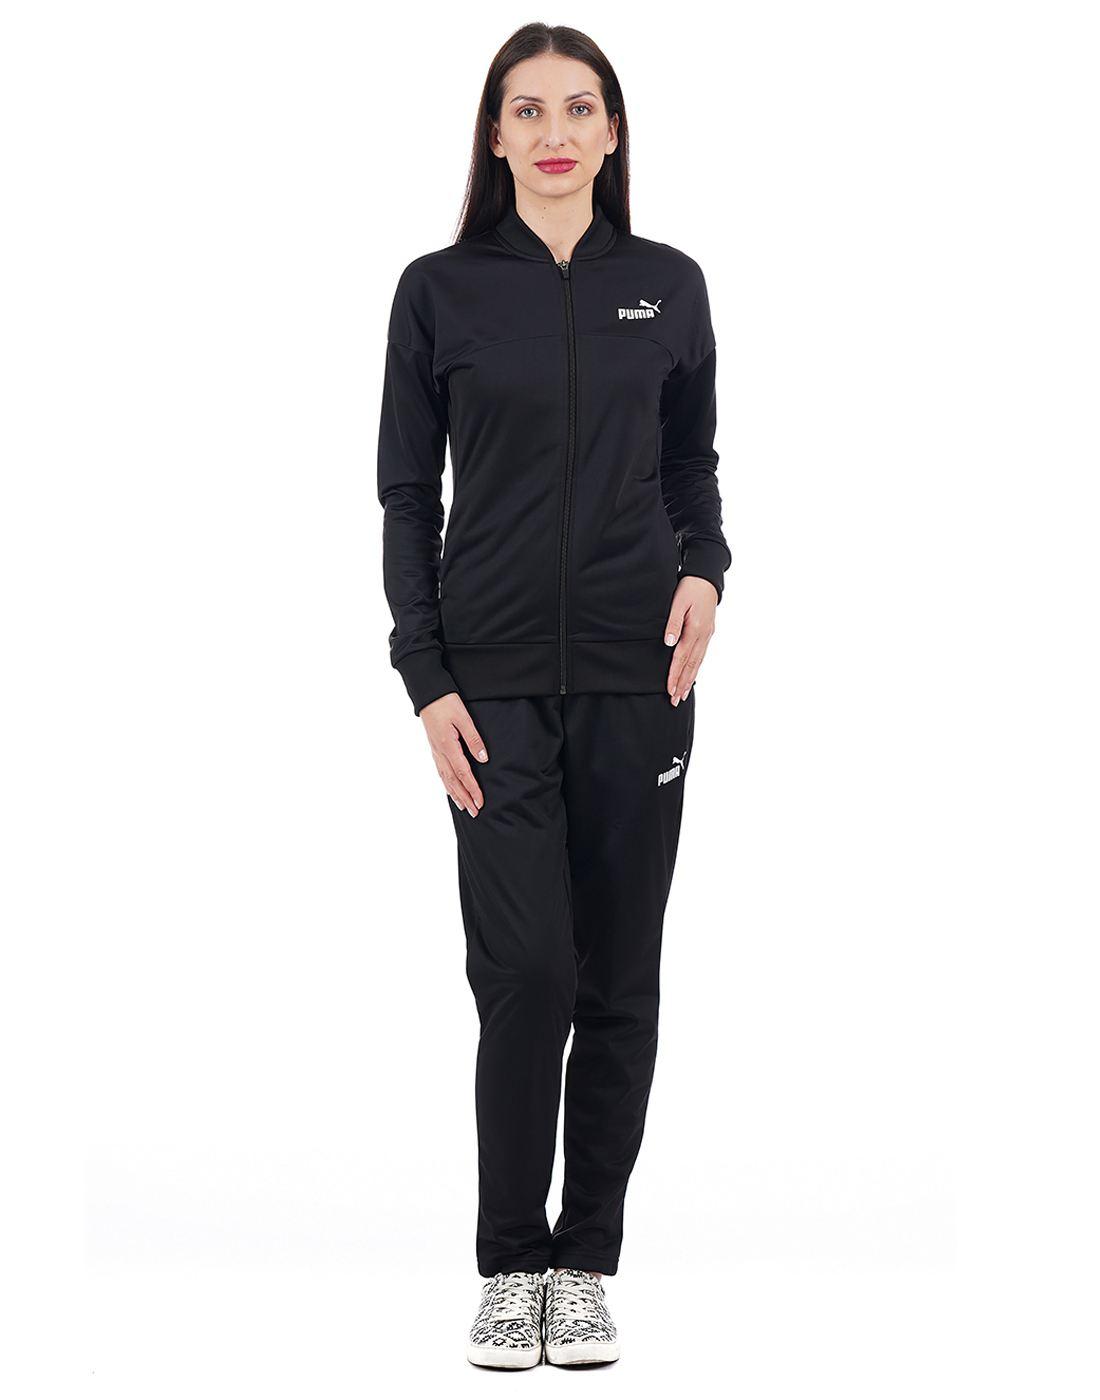 Puma Women Black Track Suit